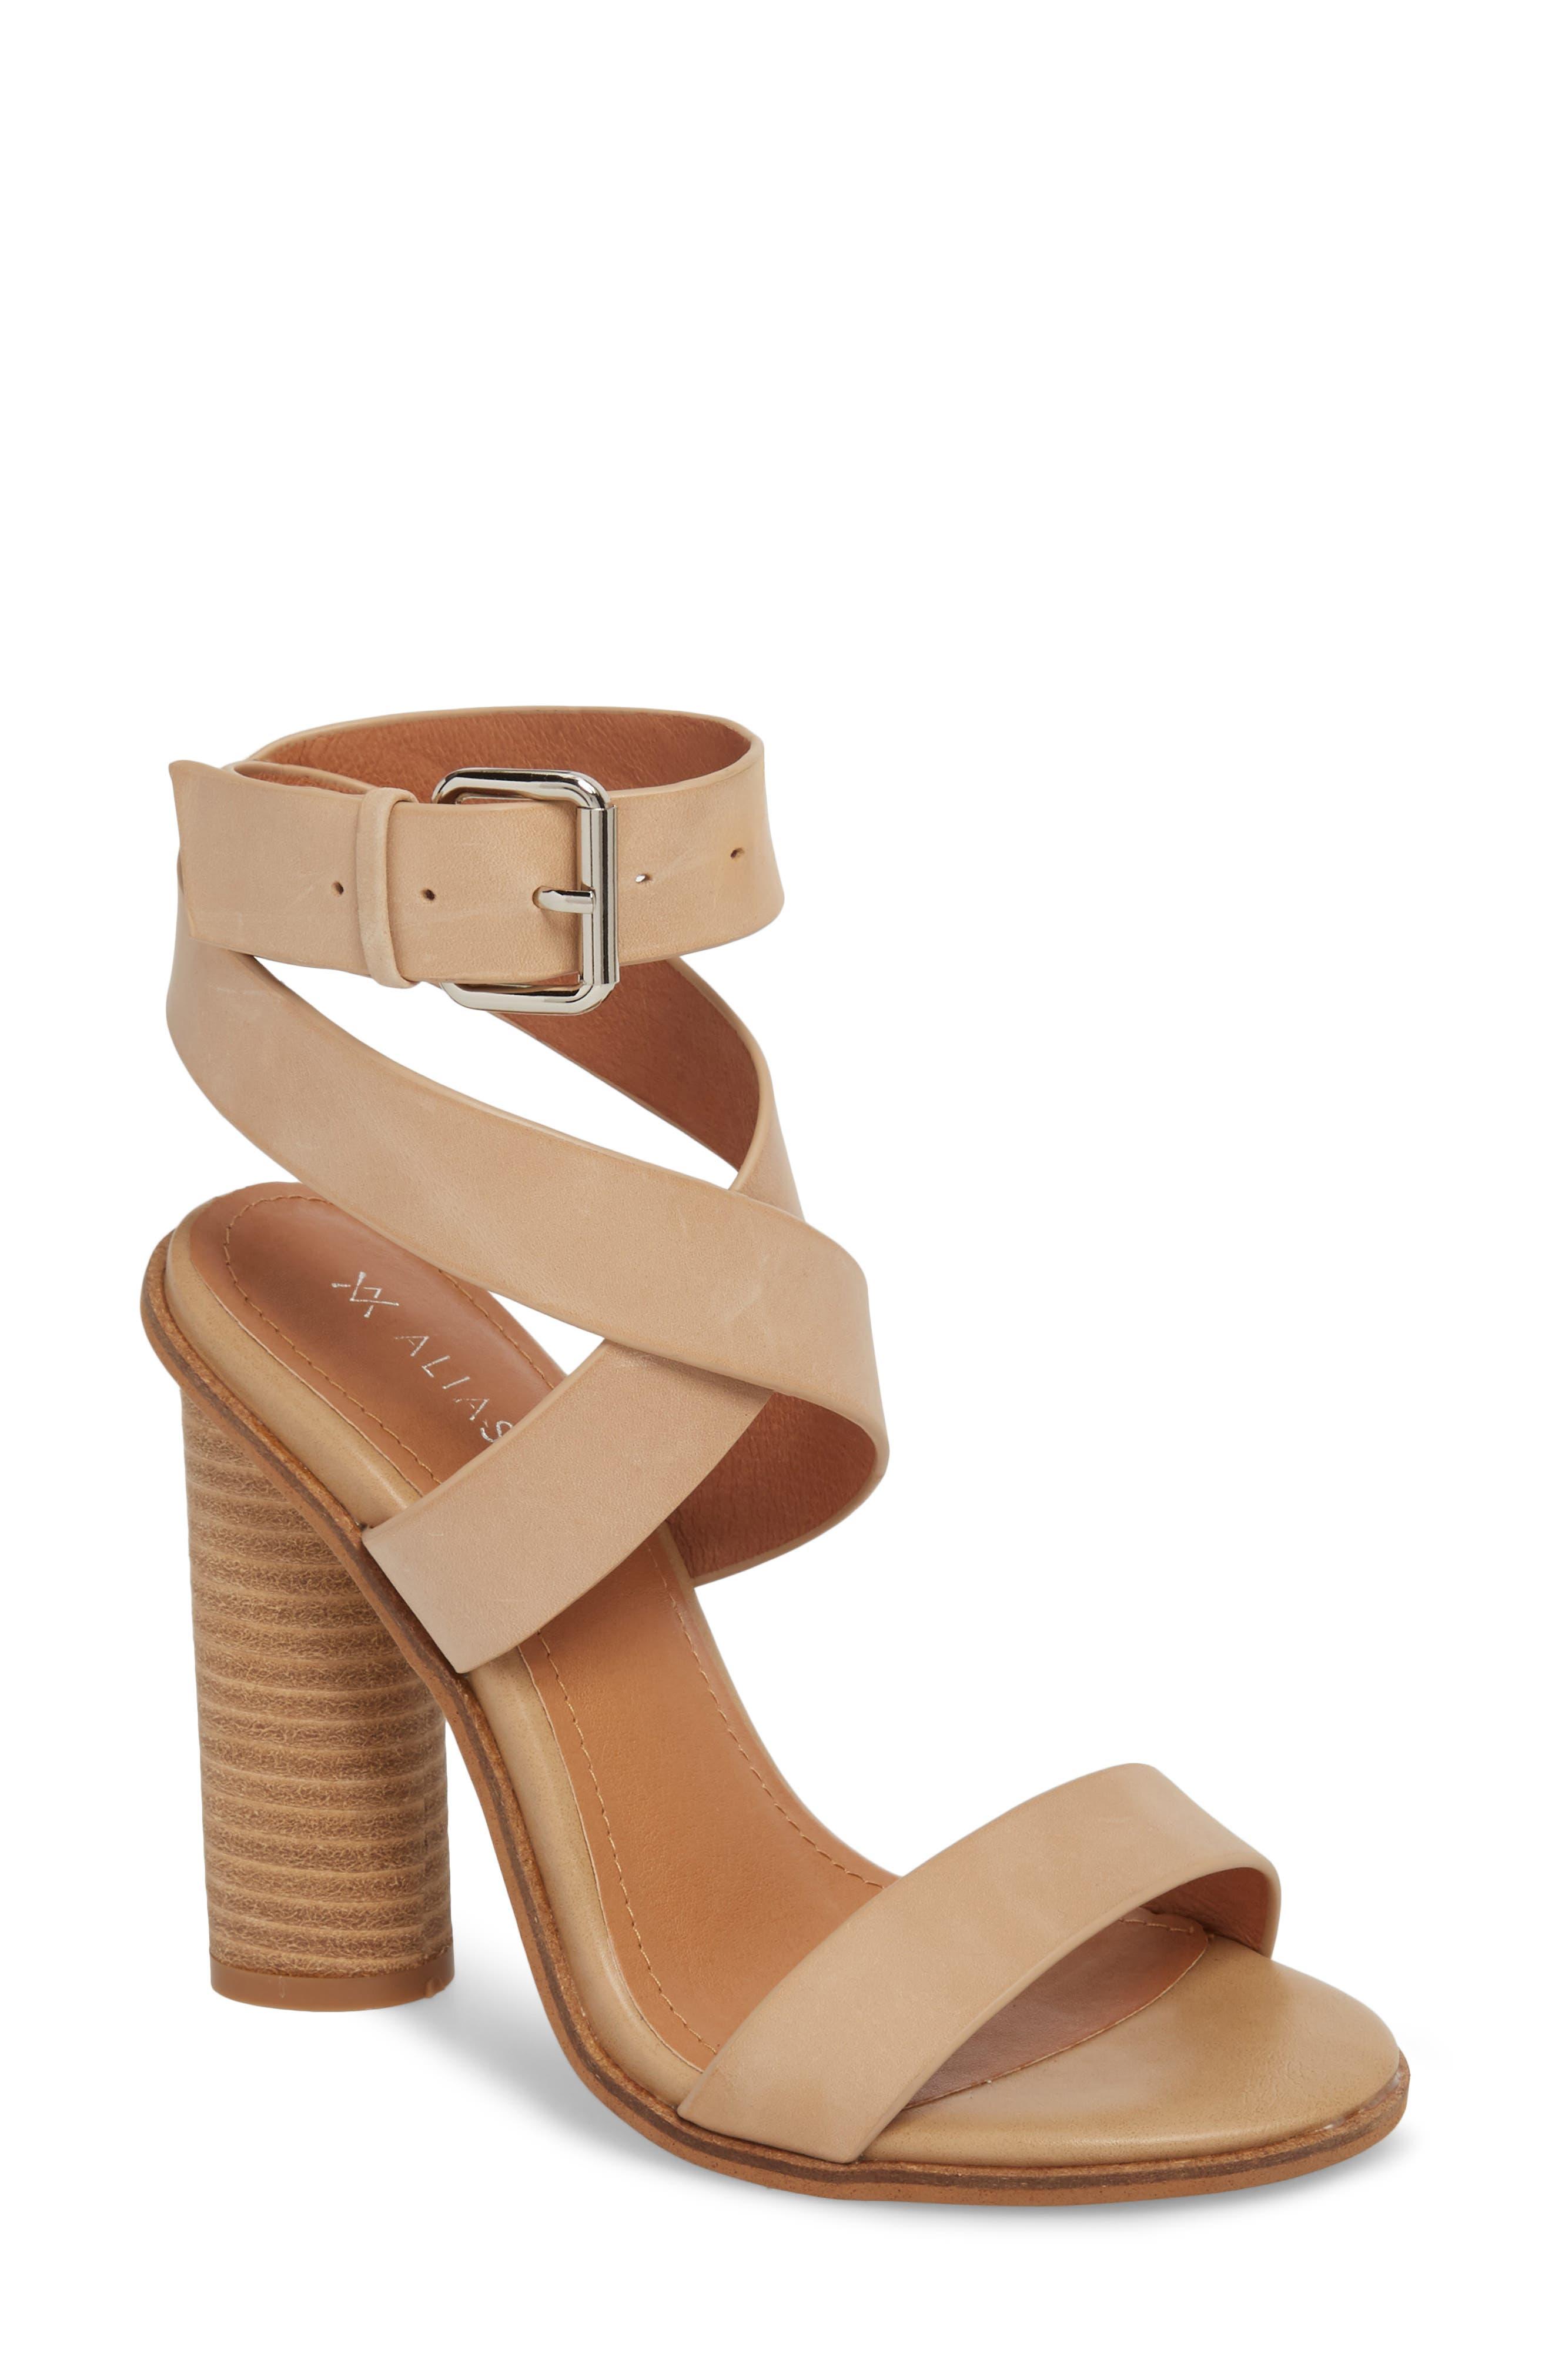 Abaala Cross Strap Sandal,                             Main thumbnail 1, color,                             Natural Leather